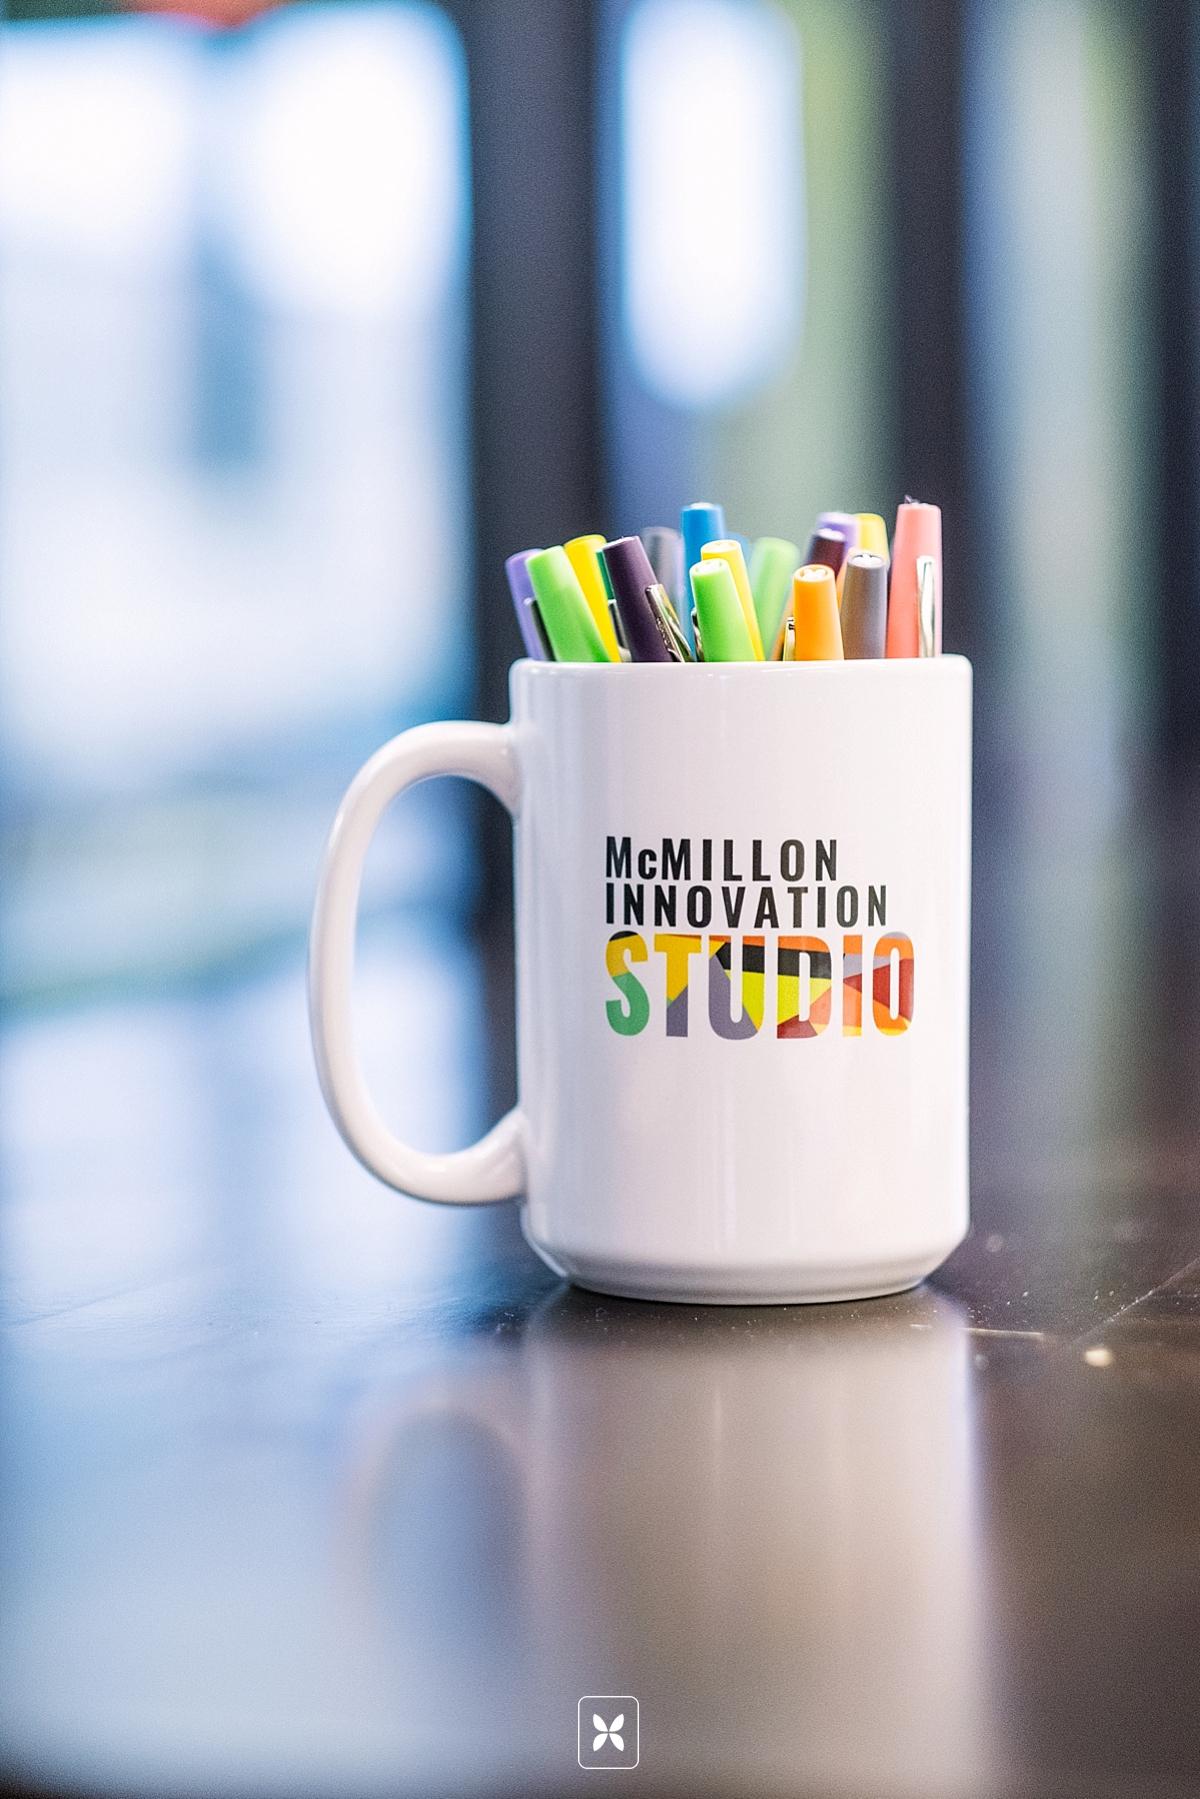 novo_studio_commercial_photography_mcmillon_innovation_studio_University_of_Arkansas_0039.jpg